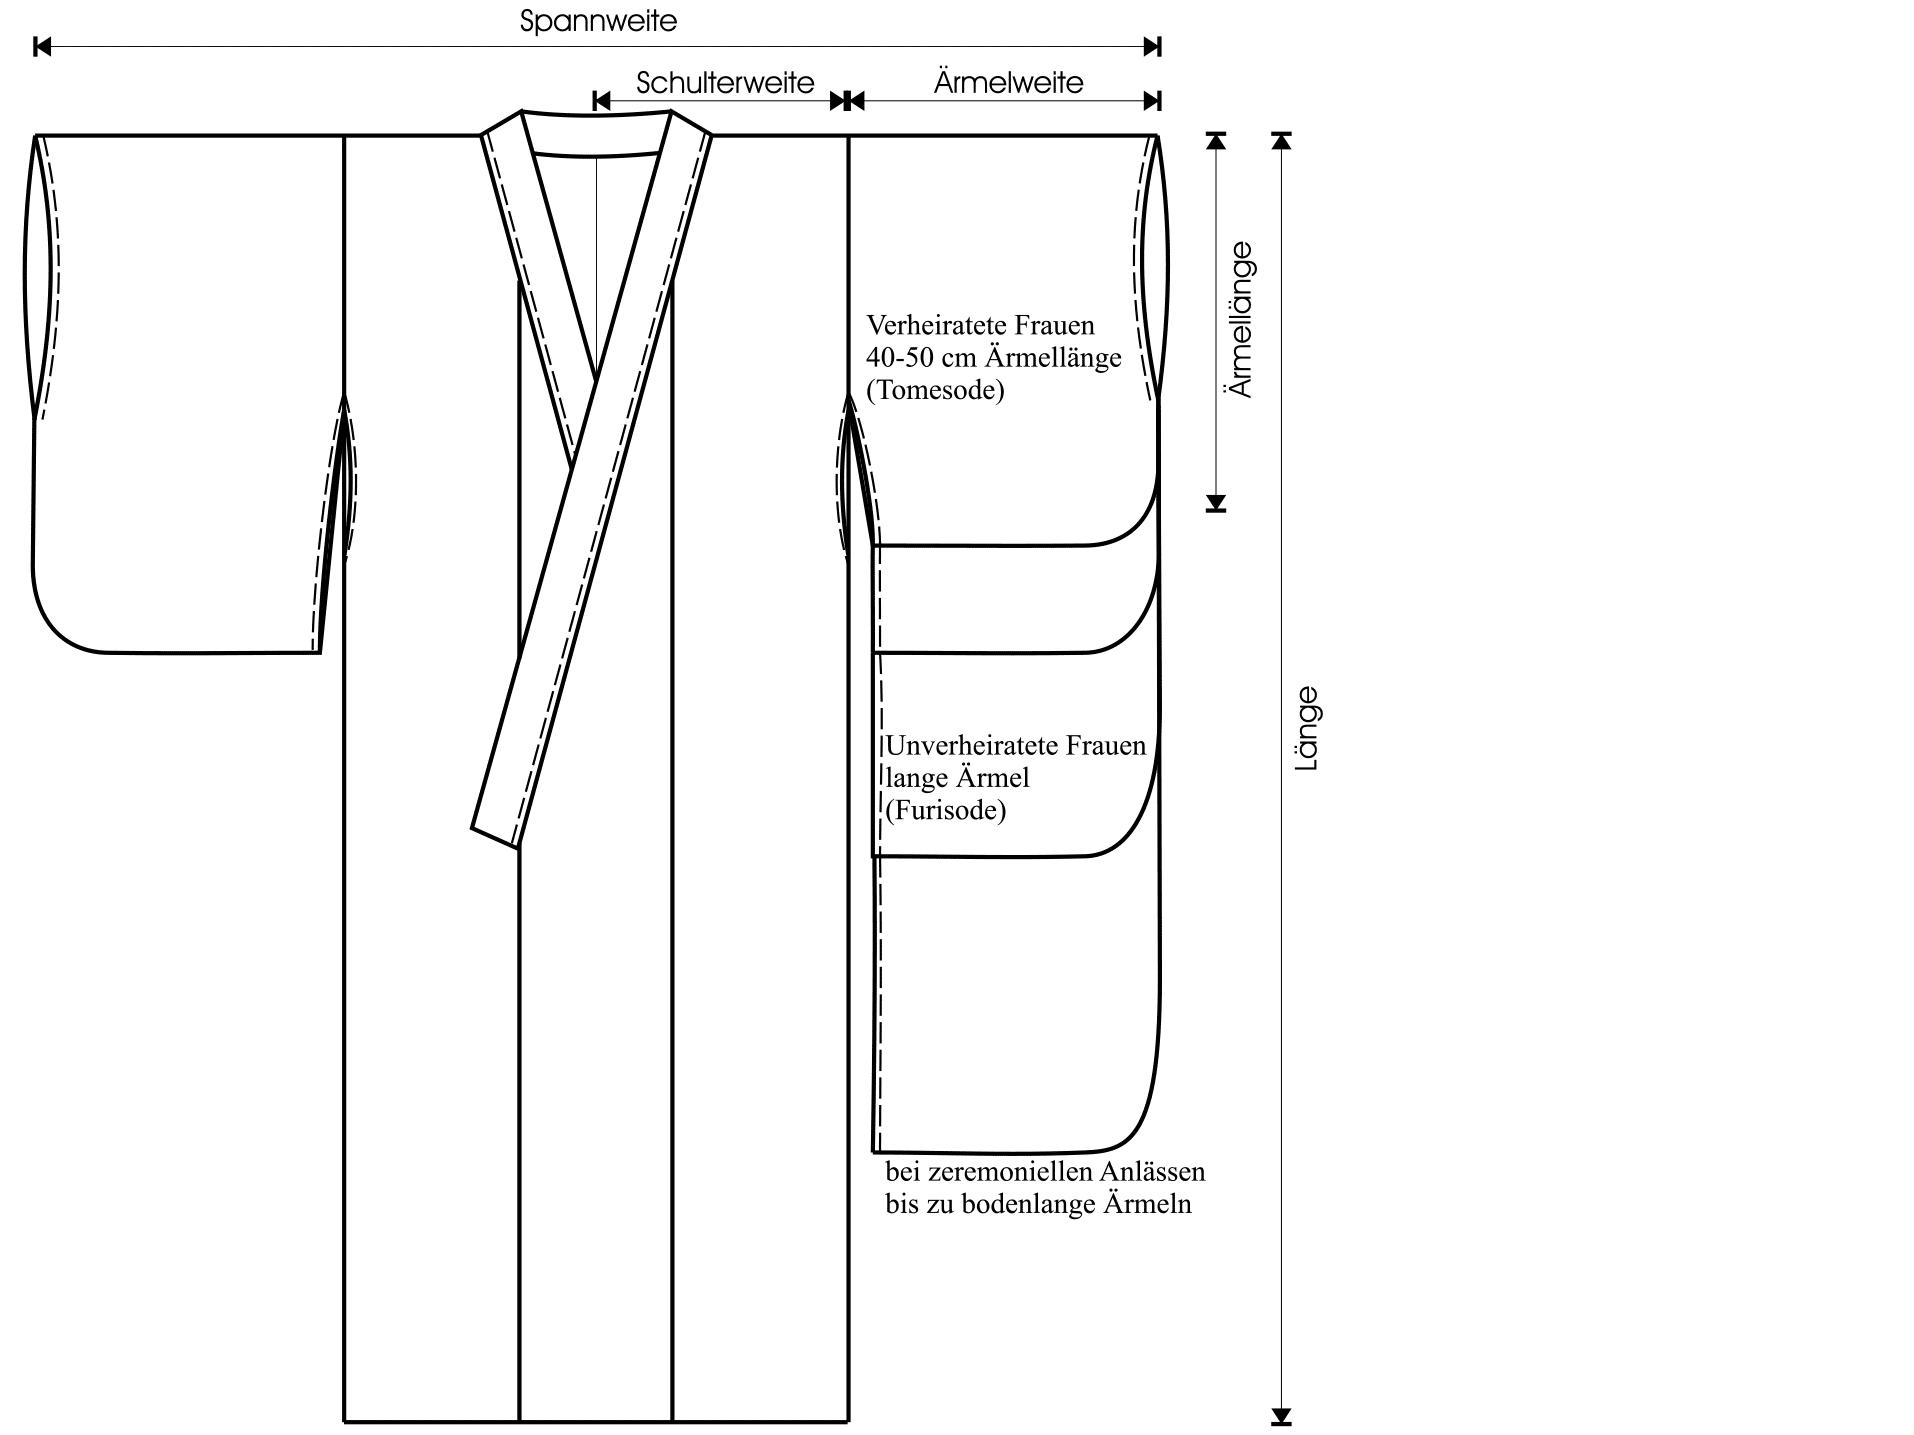 Schnittkonstruktion eines Obi, dem Gürtel des Kimonos